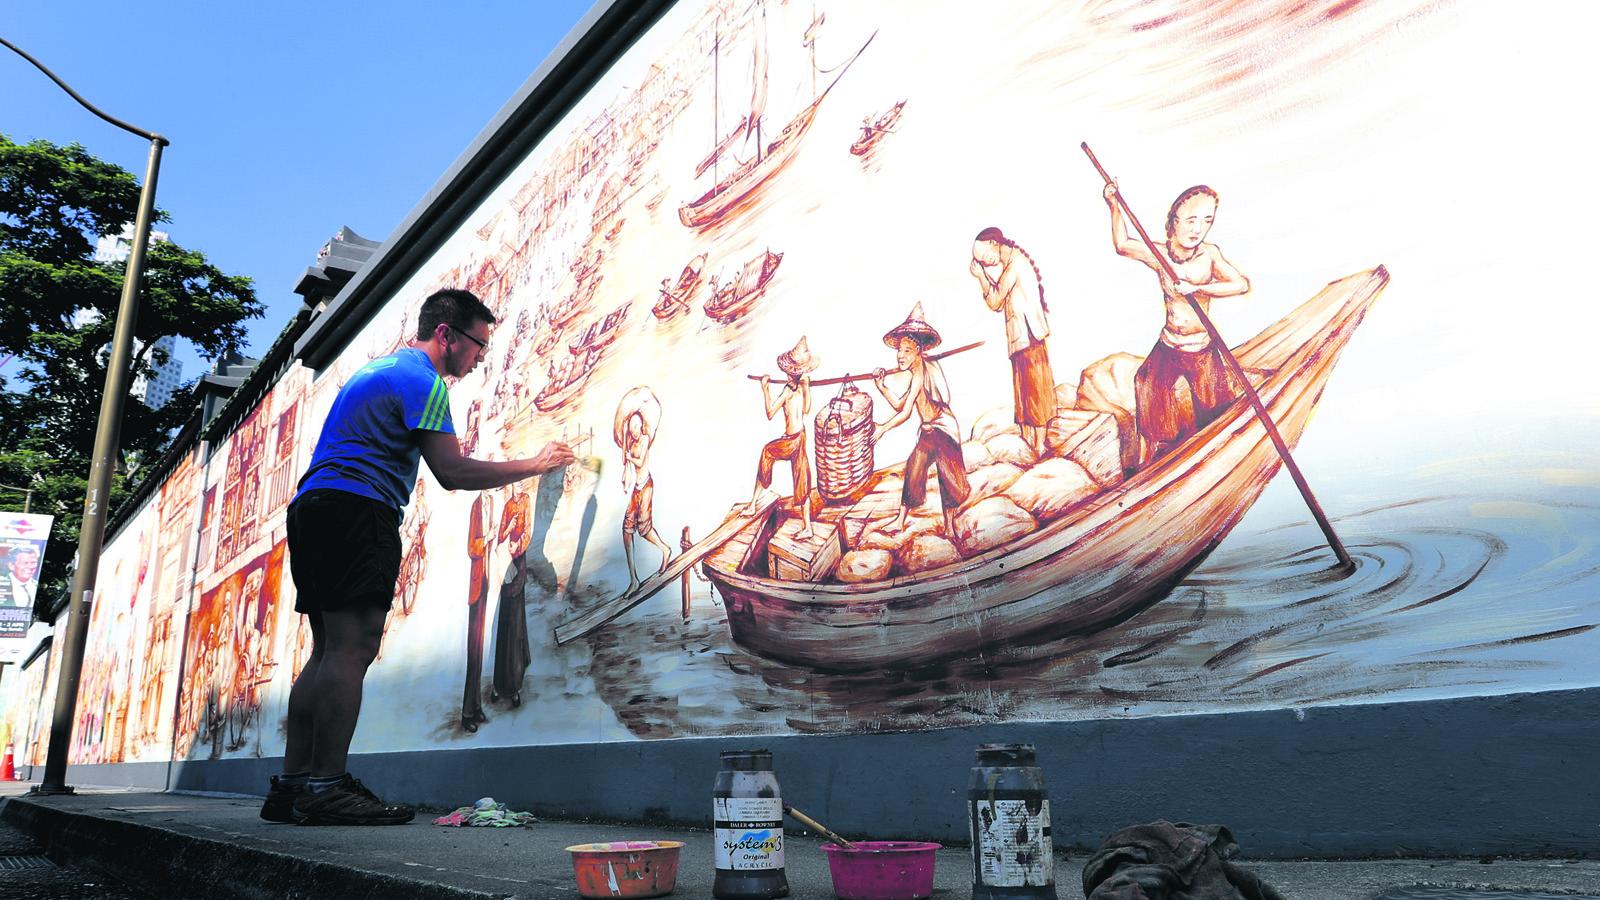 Yip_Yew_Chong_painting_his_mural_at_Amoy_Street.jpg